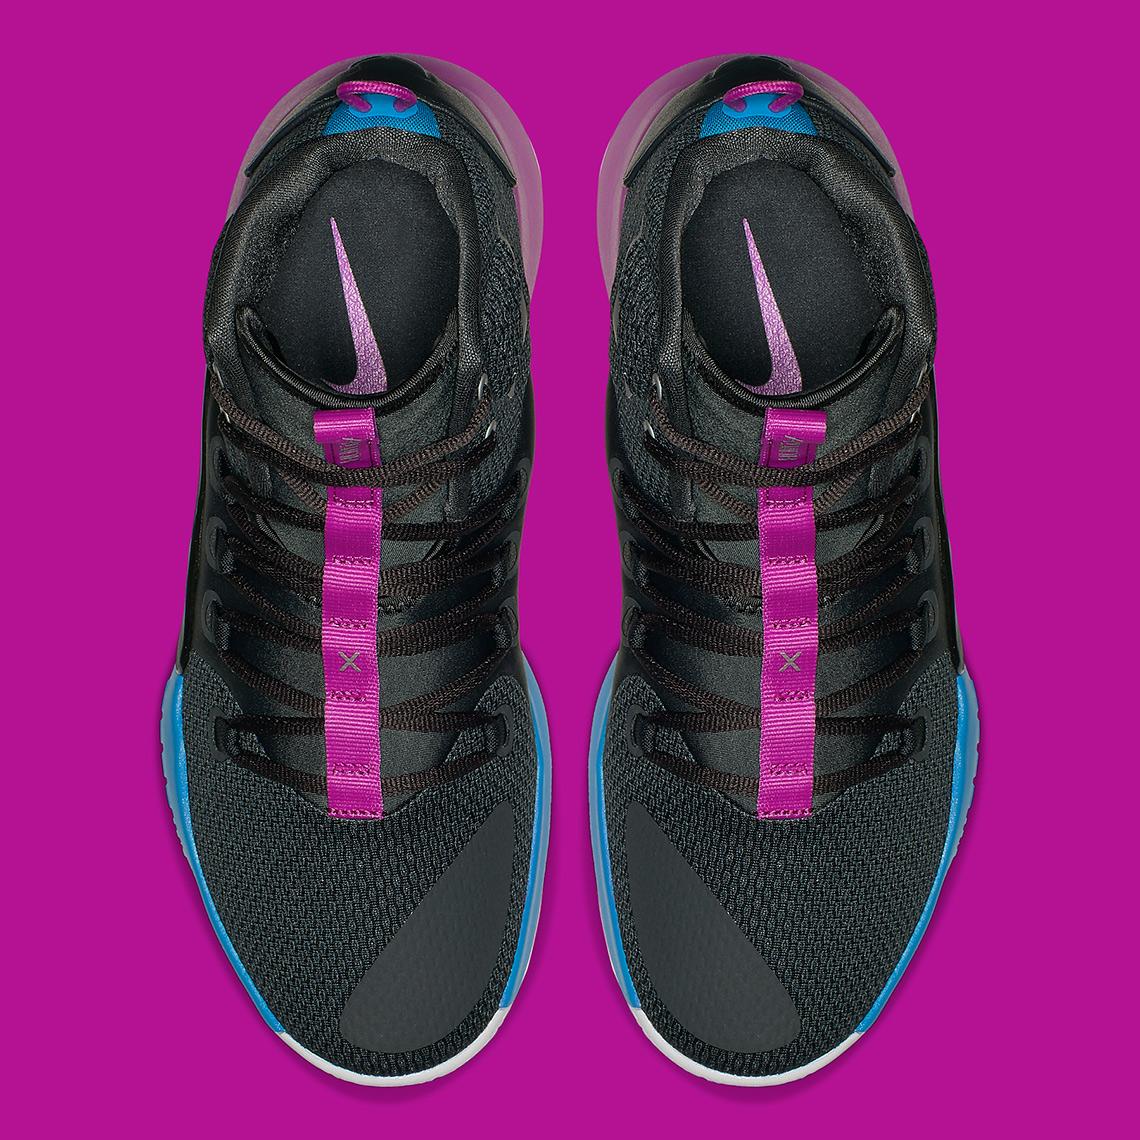 reputable site 73203 73a52 Nike Hyperdunk X Flight Huarache AO7893-002   SneakerNews.com